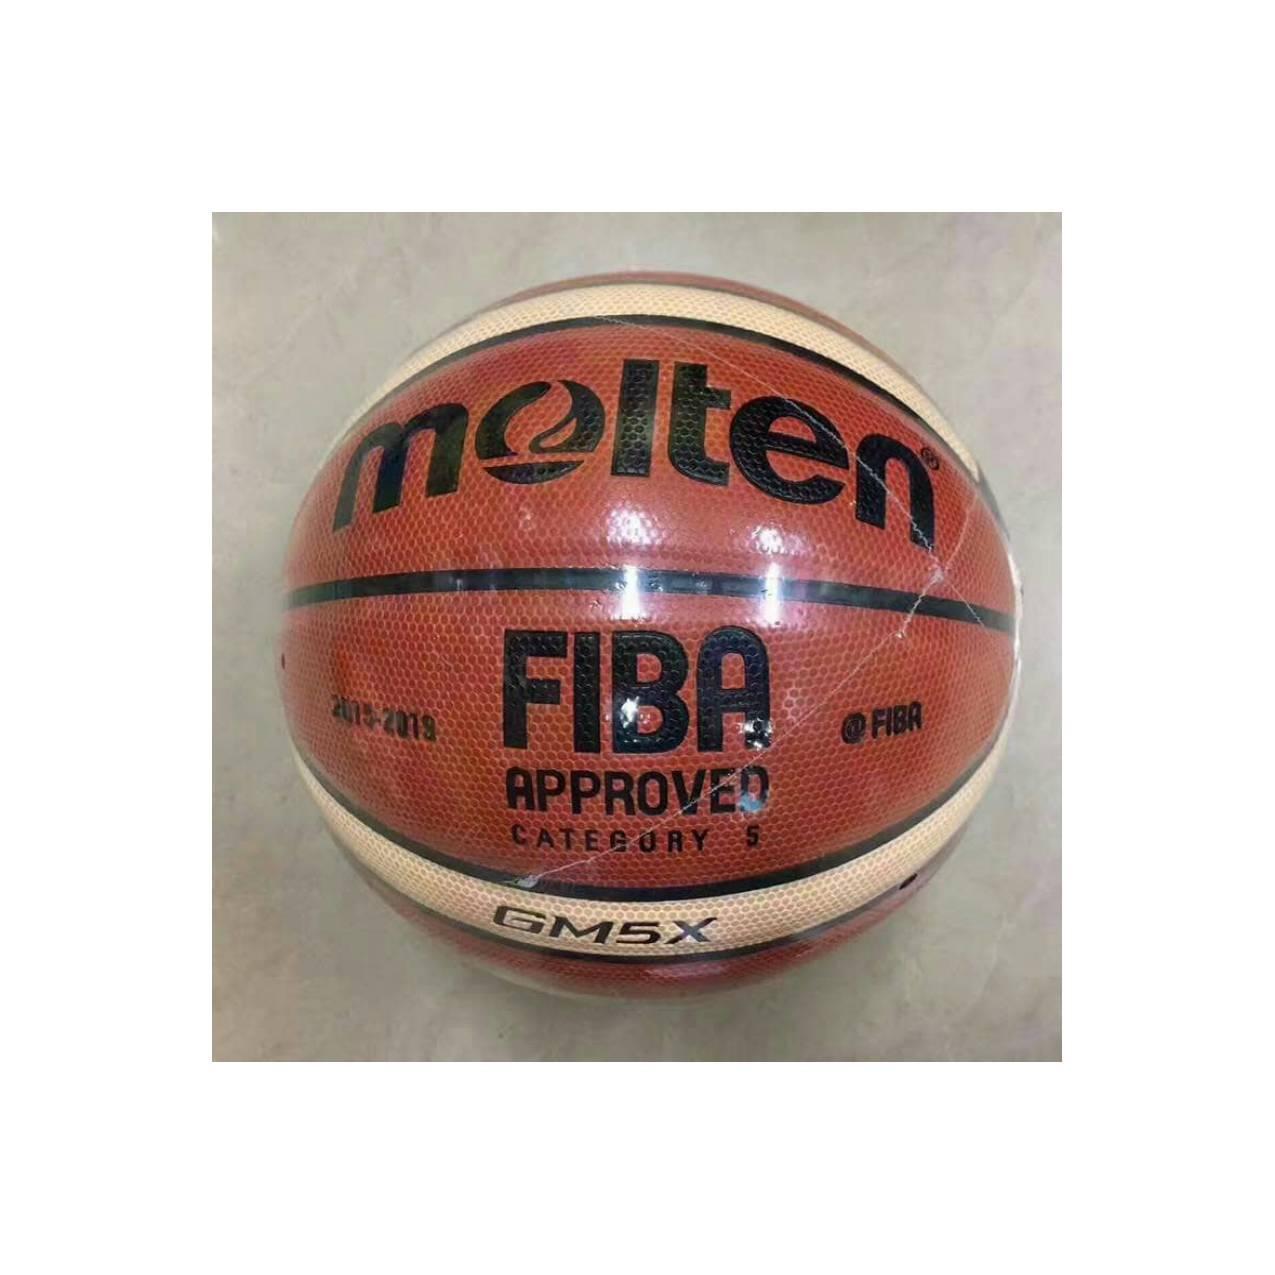 Bola Basket Gg7 Kulit Pompa Harga Sahabat Daftar Terlengkap Molten Gg7x Import Thailand Fiba Gg6x Gm5x Mikasa 1000